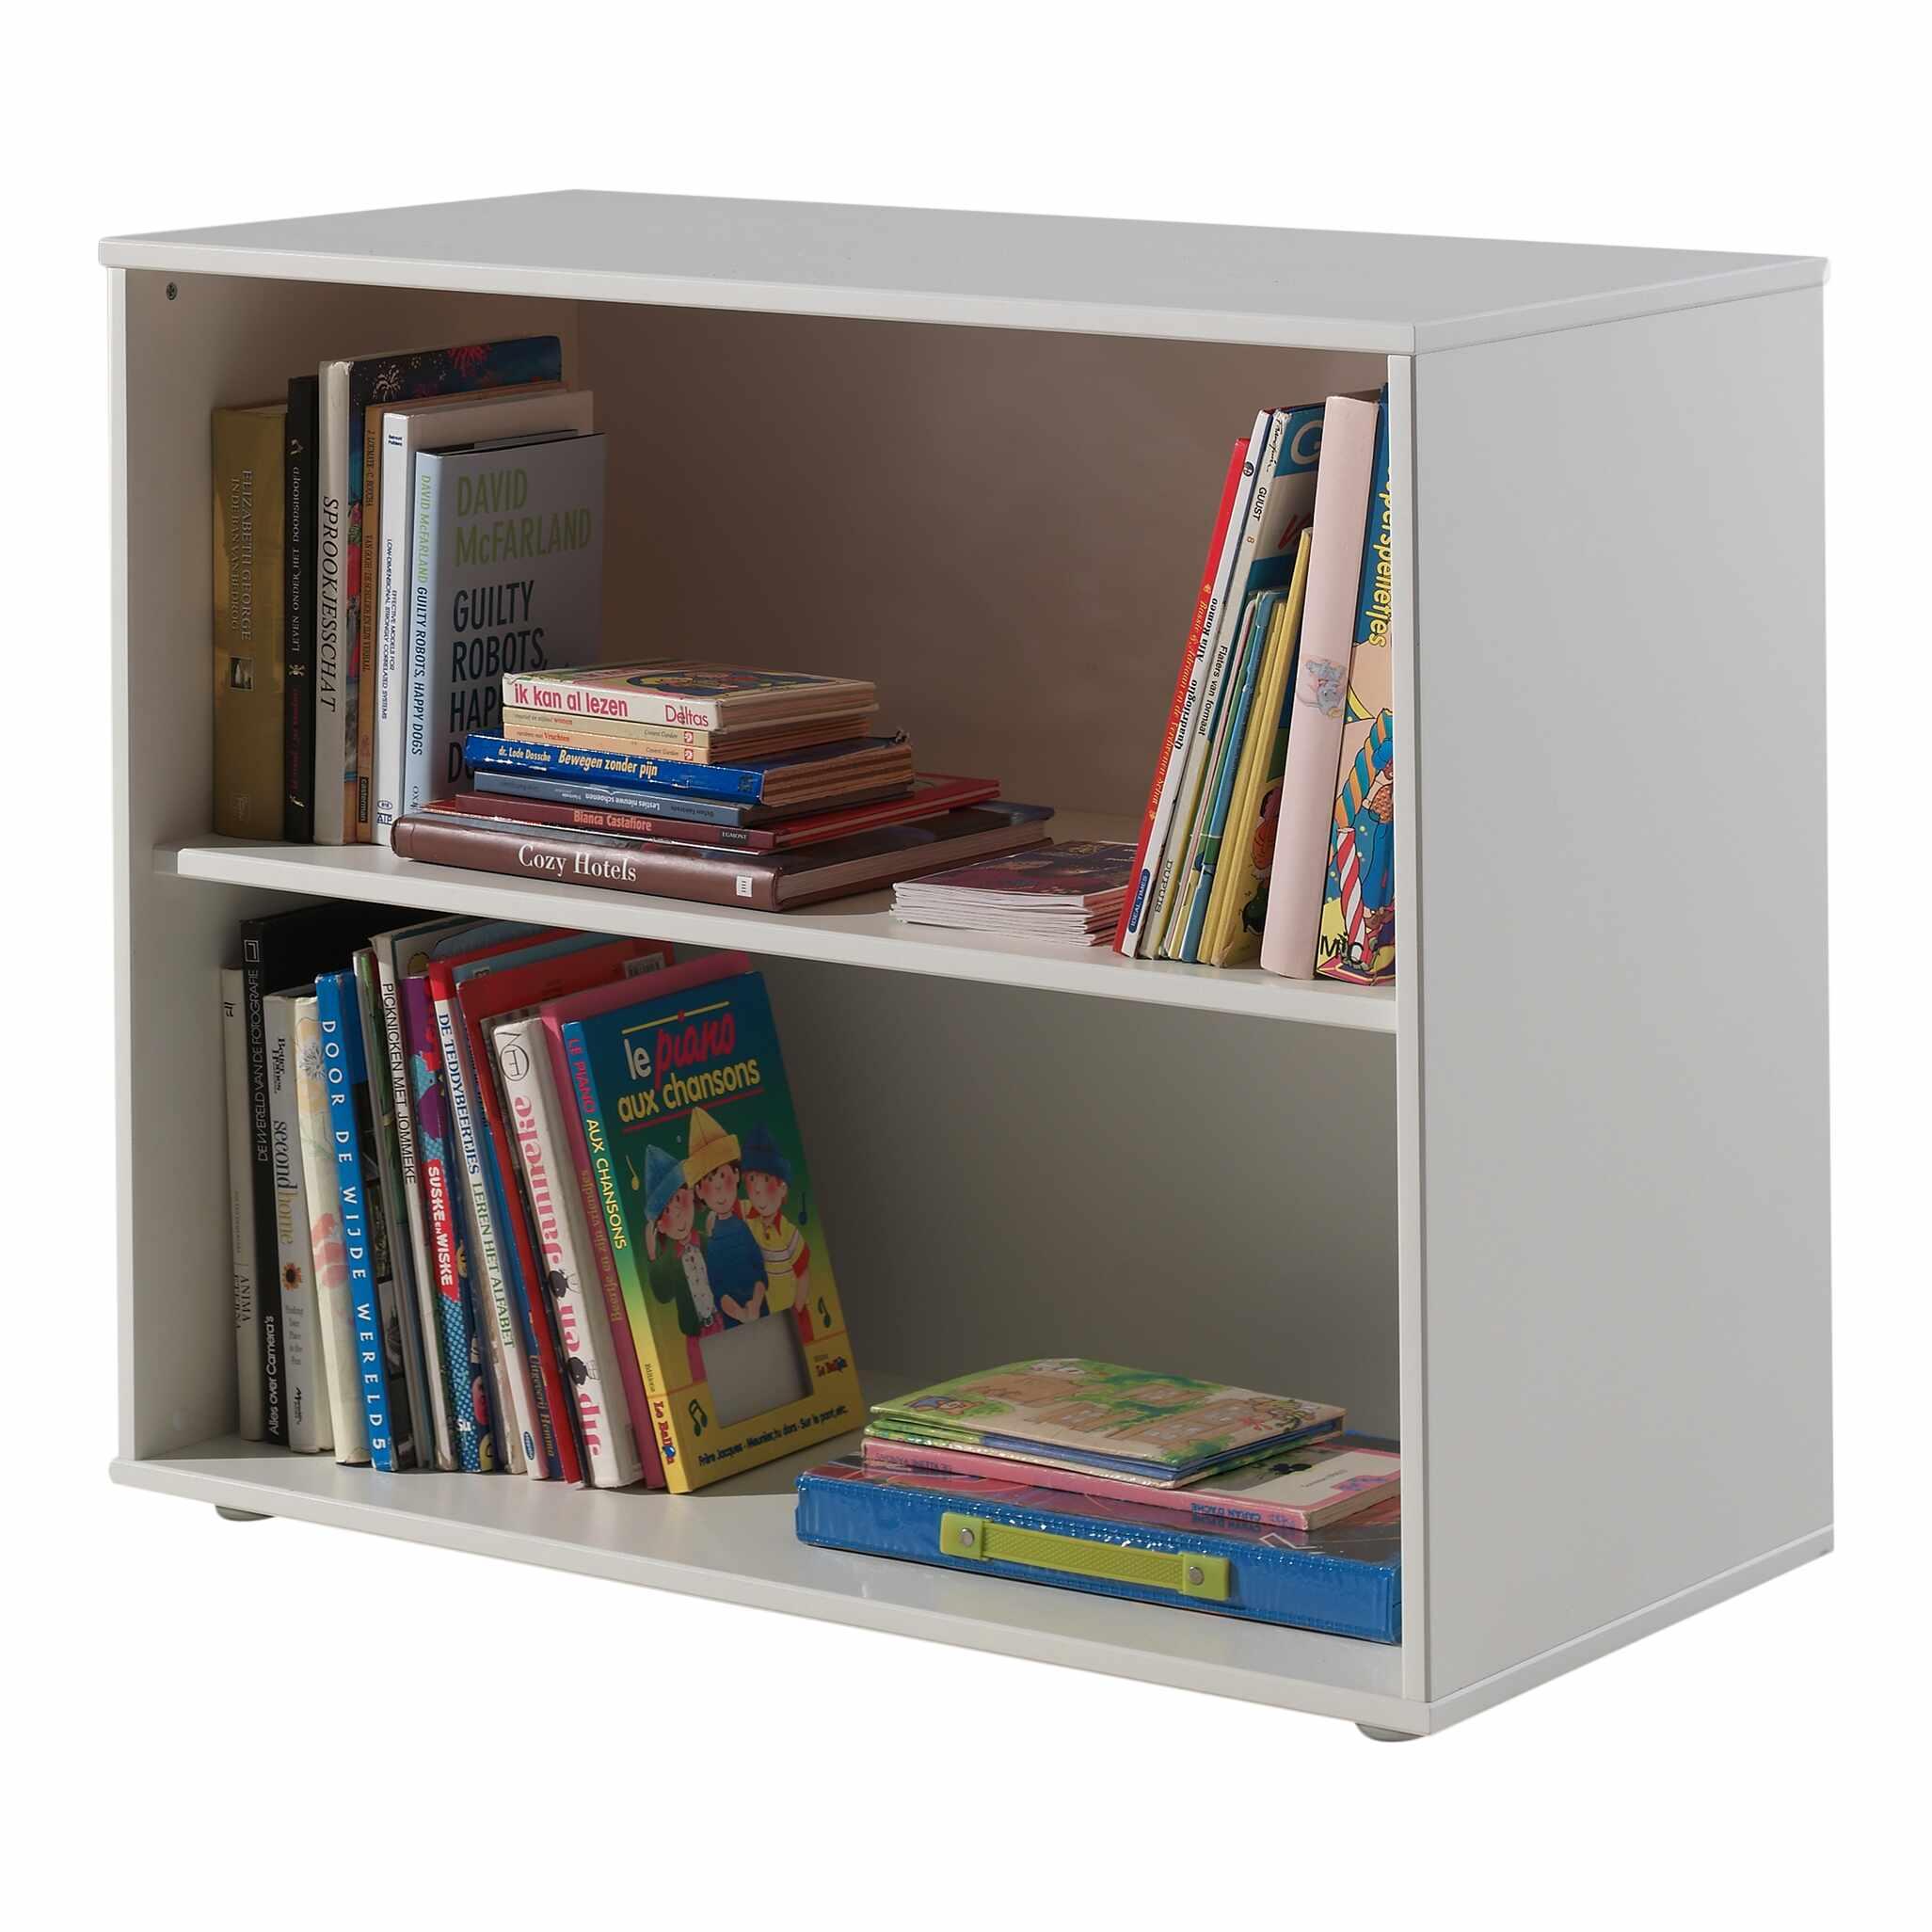 Biblioteca din MDF pentru copii Pino Alb, l85,5xA43,3xH71,8 cm la pret 853 lei